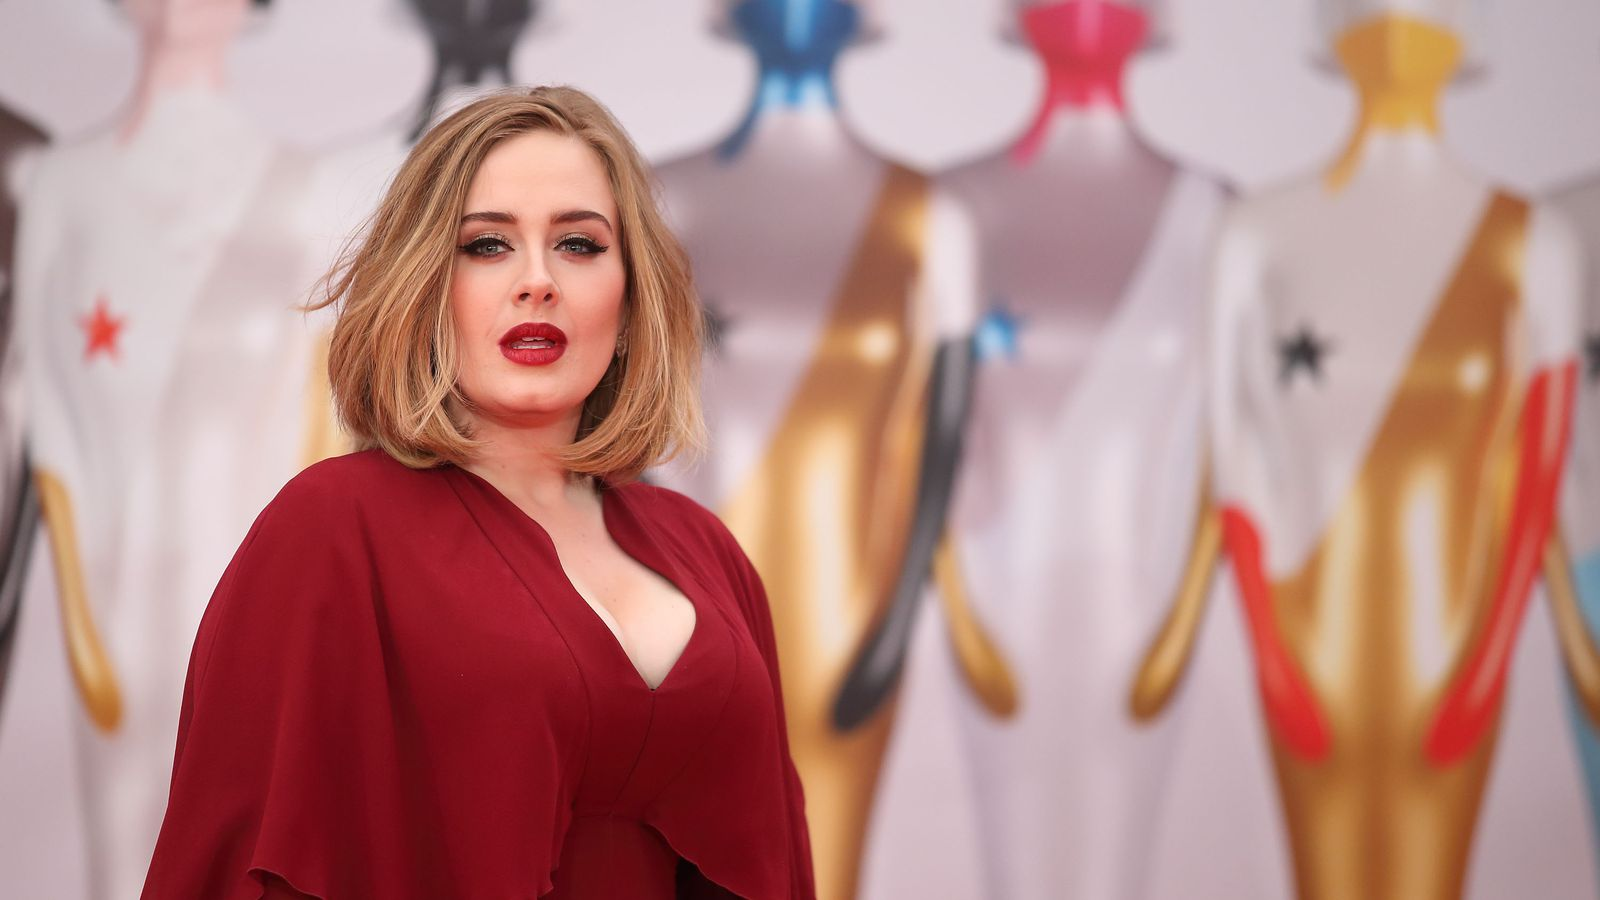 Adele and Rihanna Slayed the Brit Awards Red Carpet